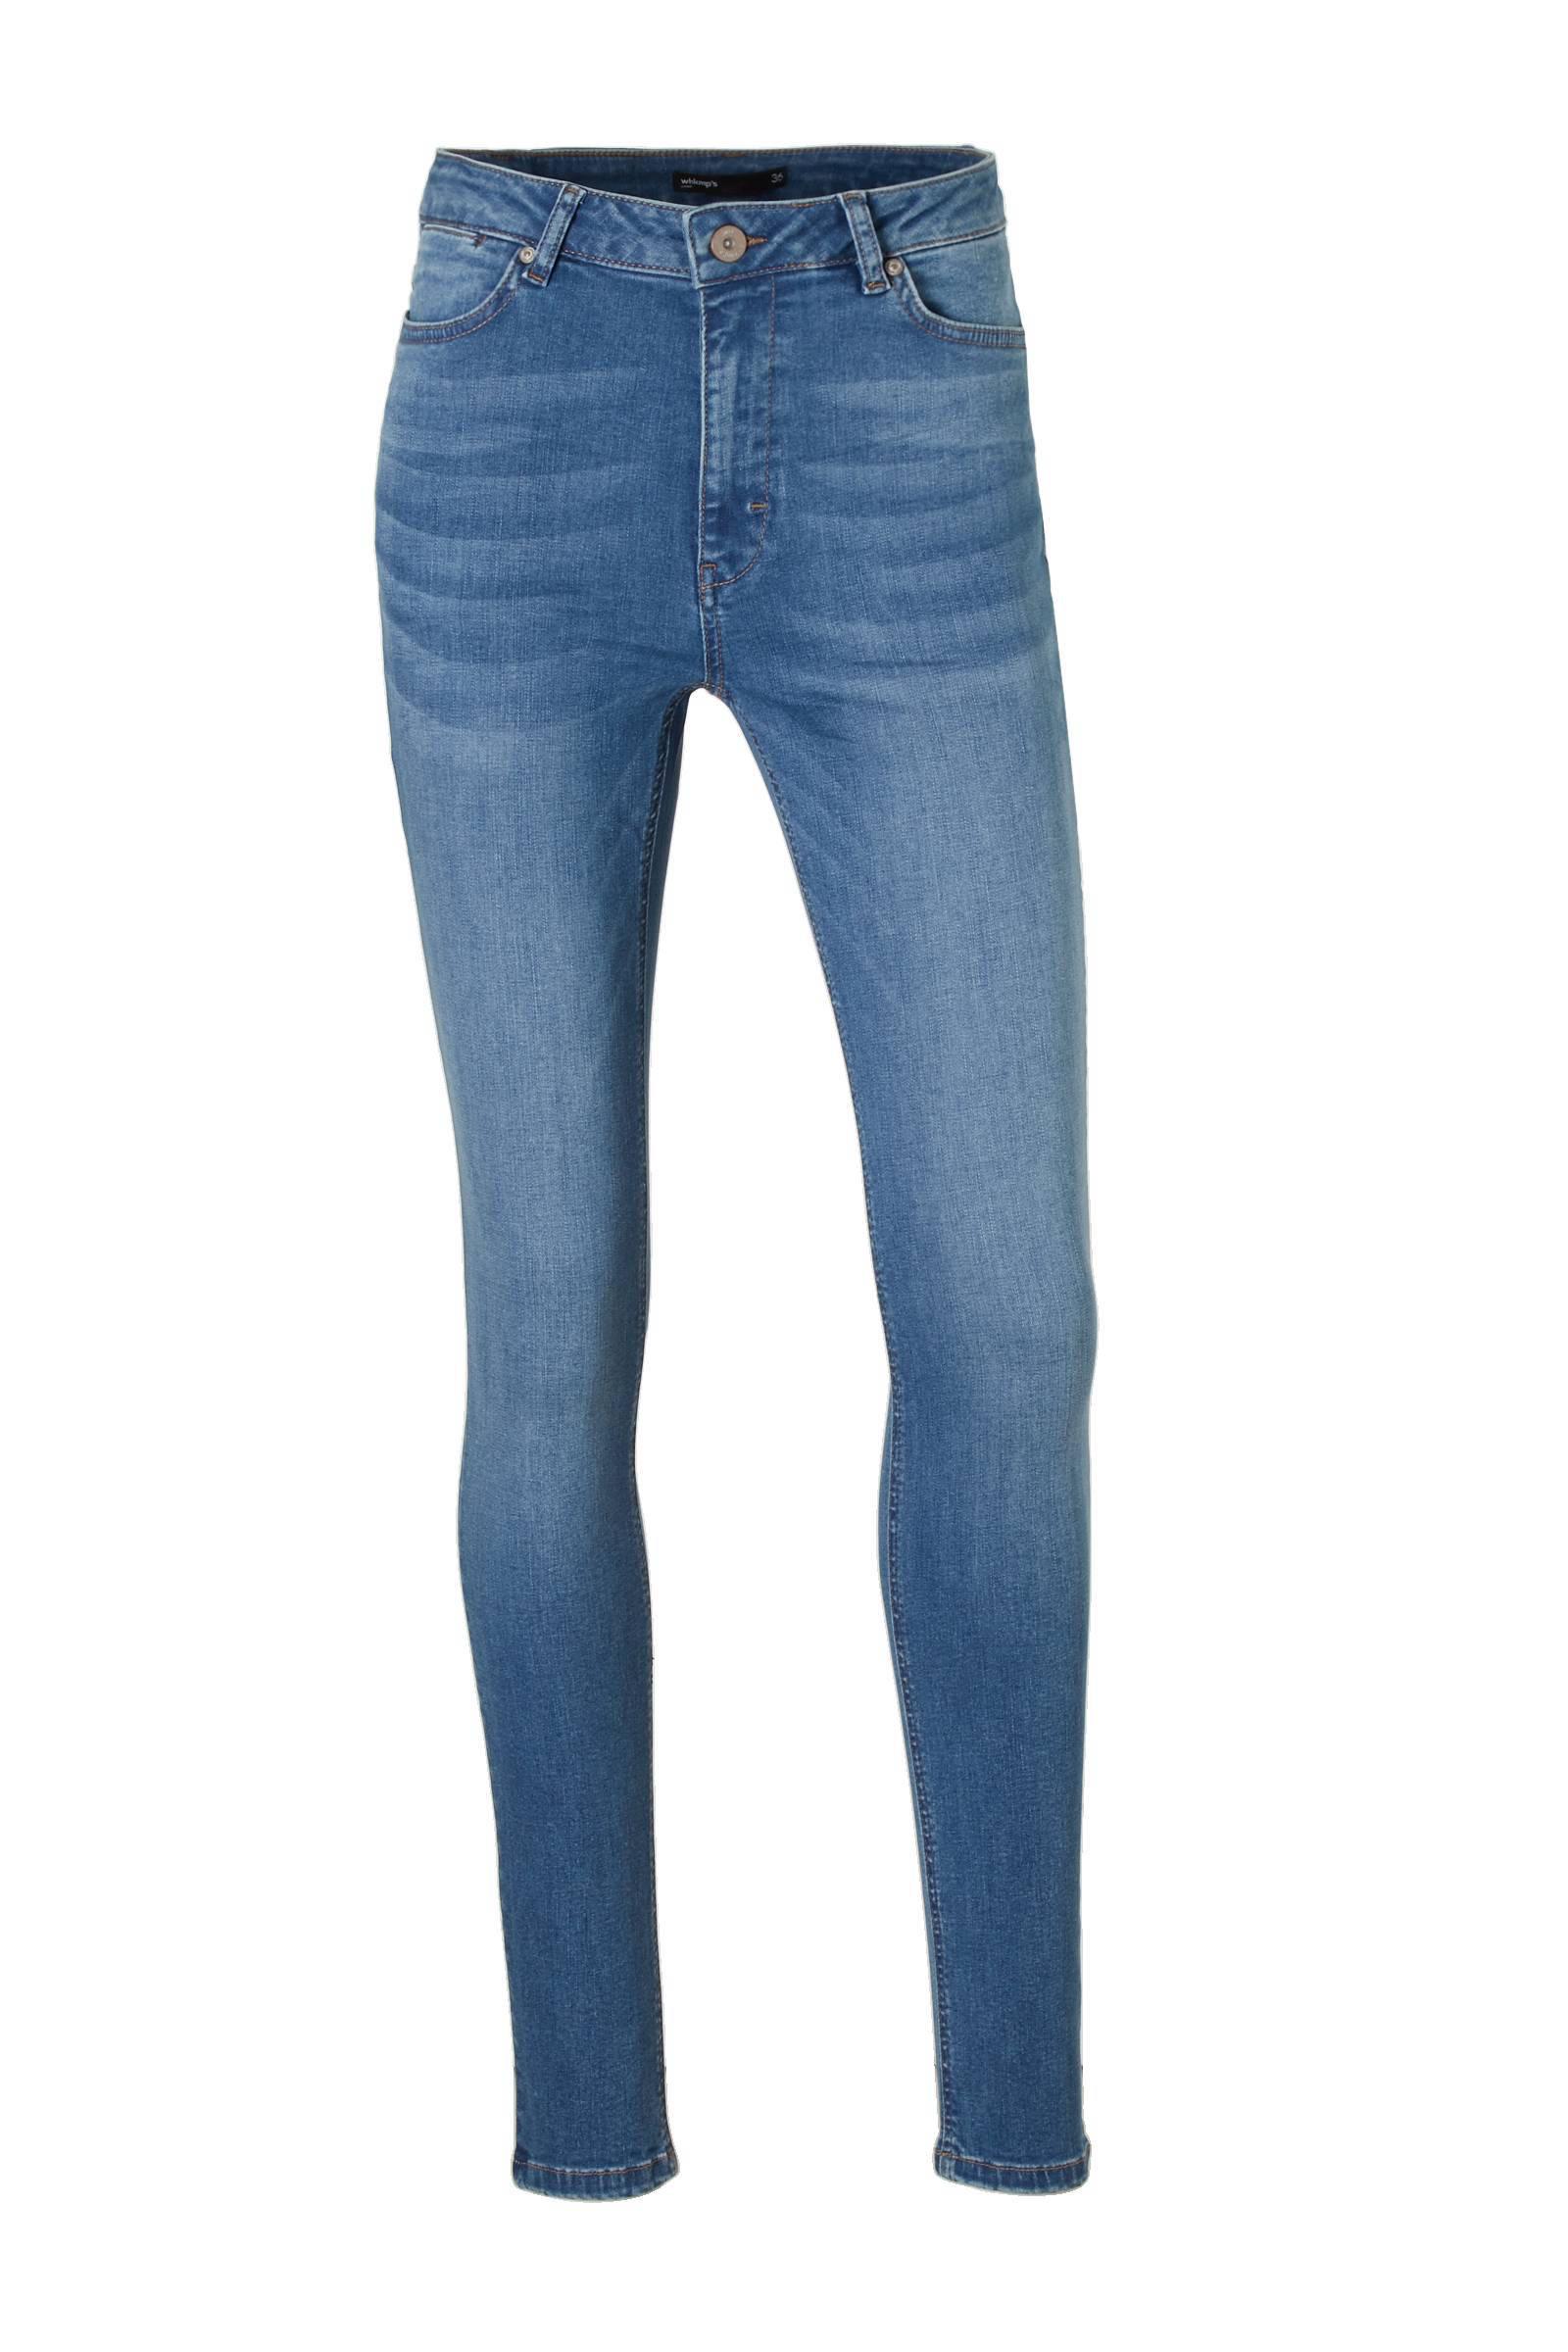 goede dames jeans